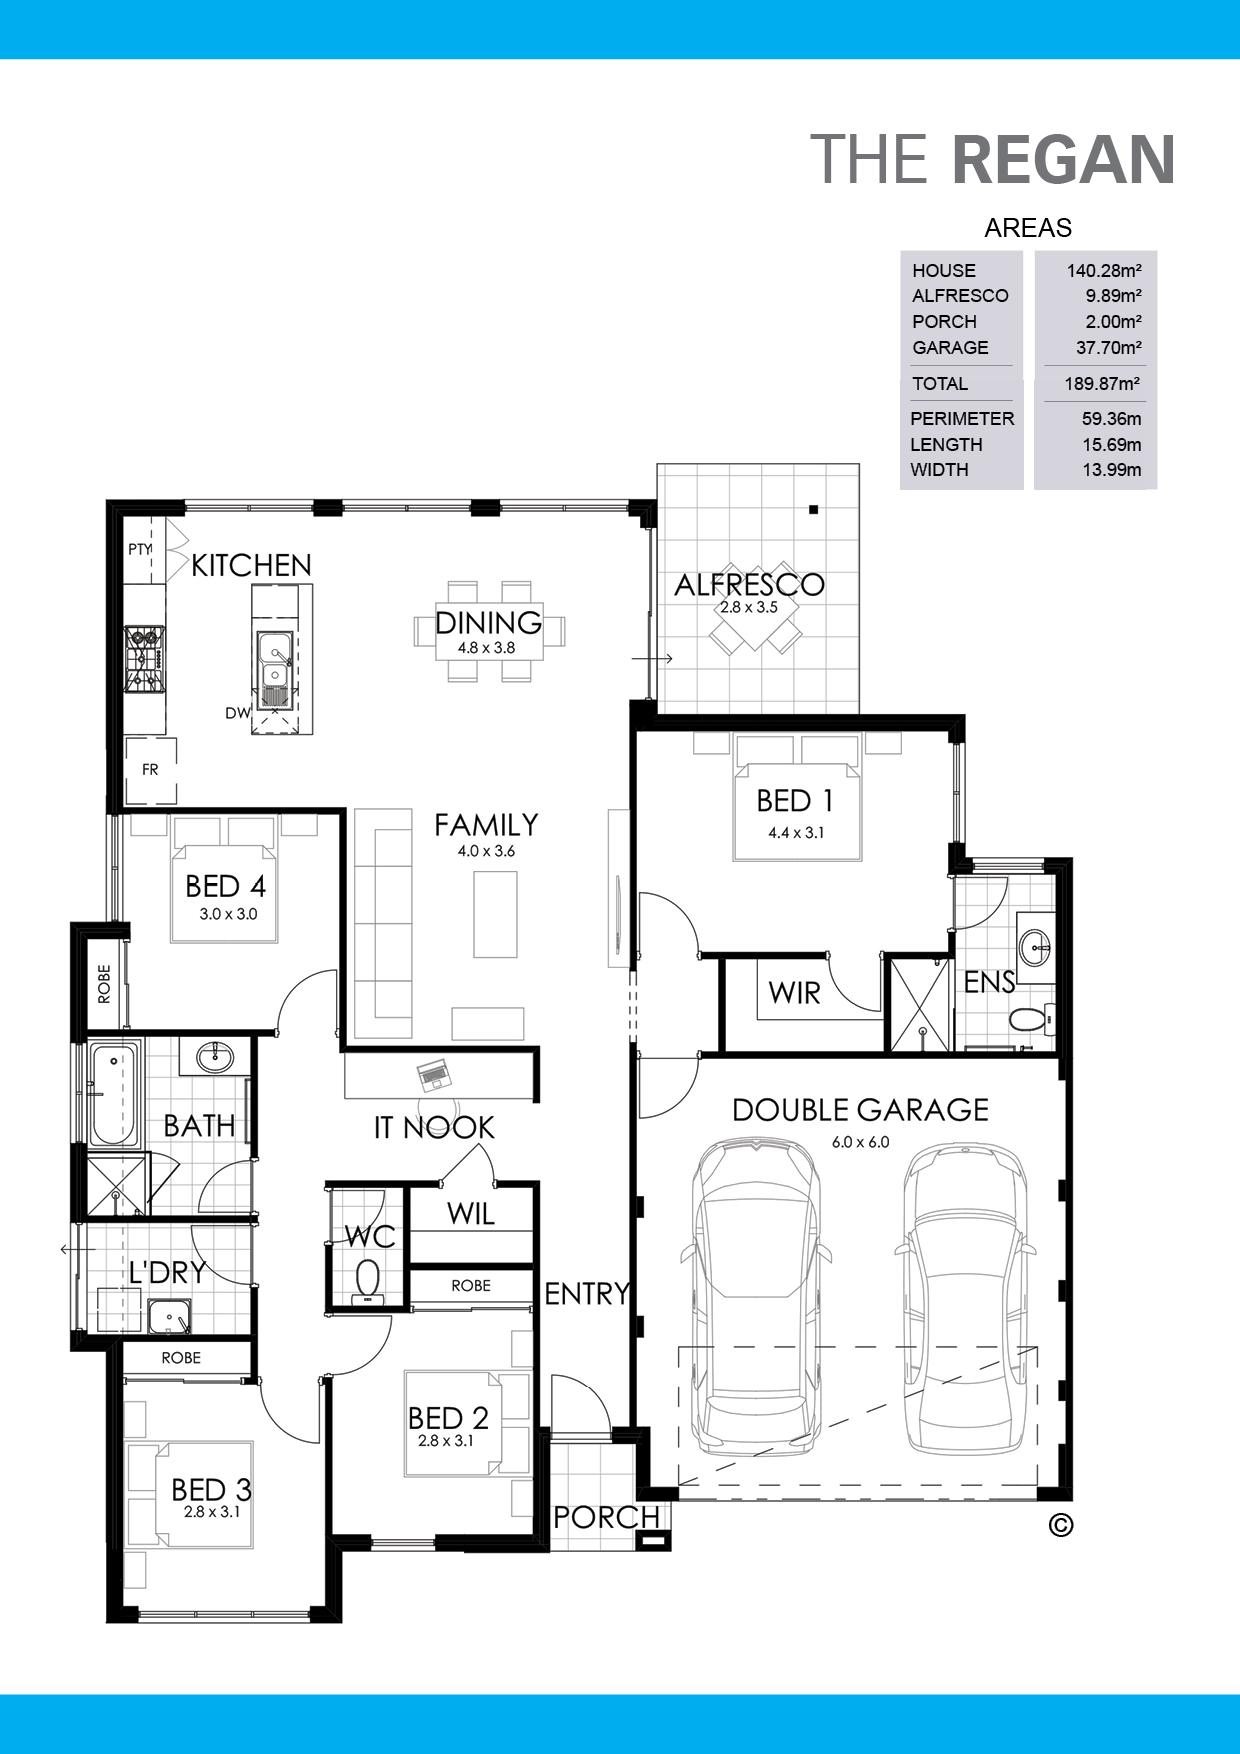 The Regan Floorplan